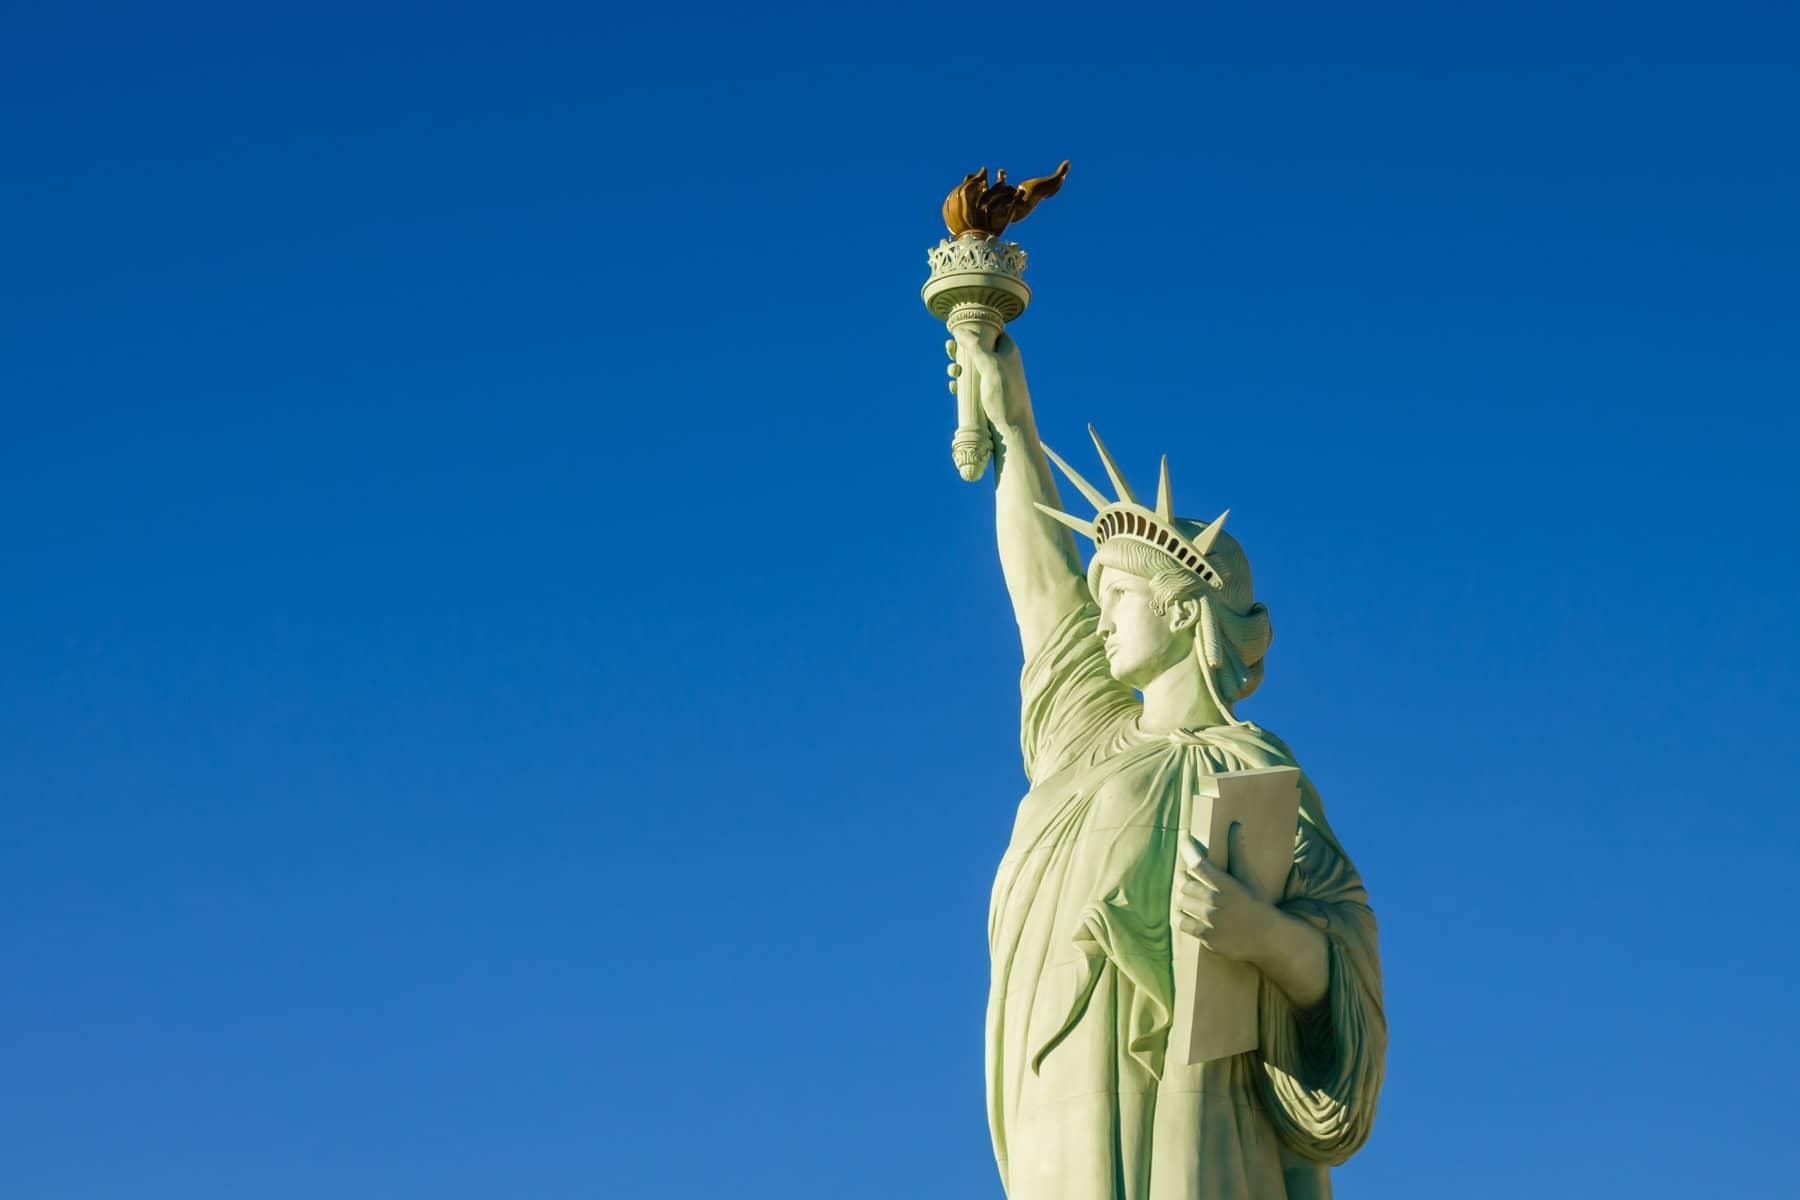 The replica Statue of Liberty at Las Vegas' New York New York Hotel & Casino.